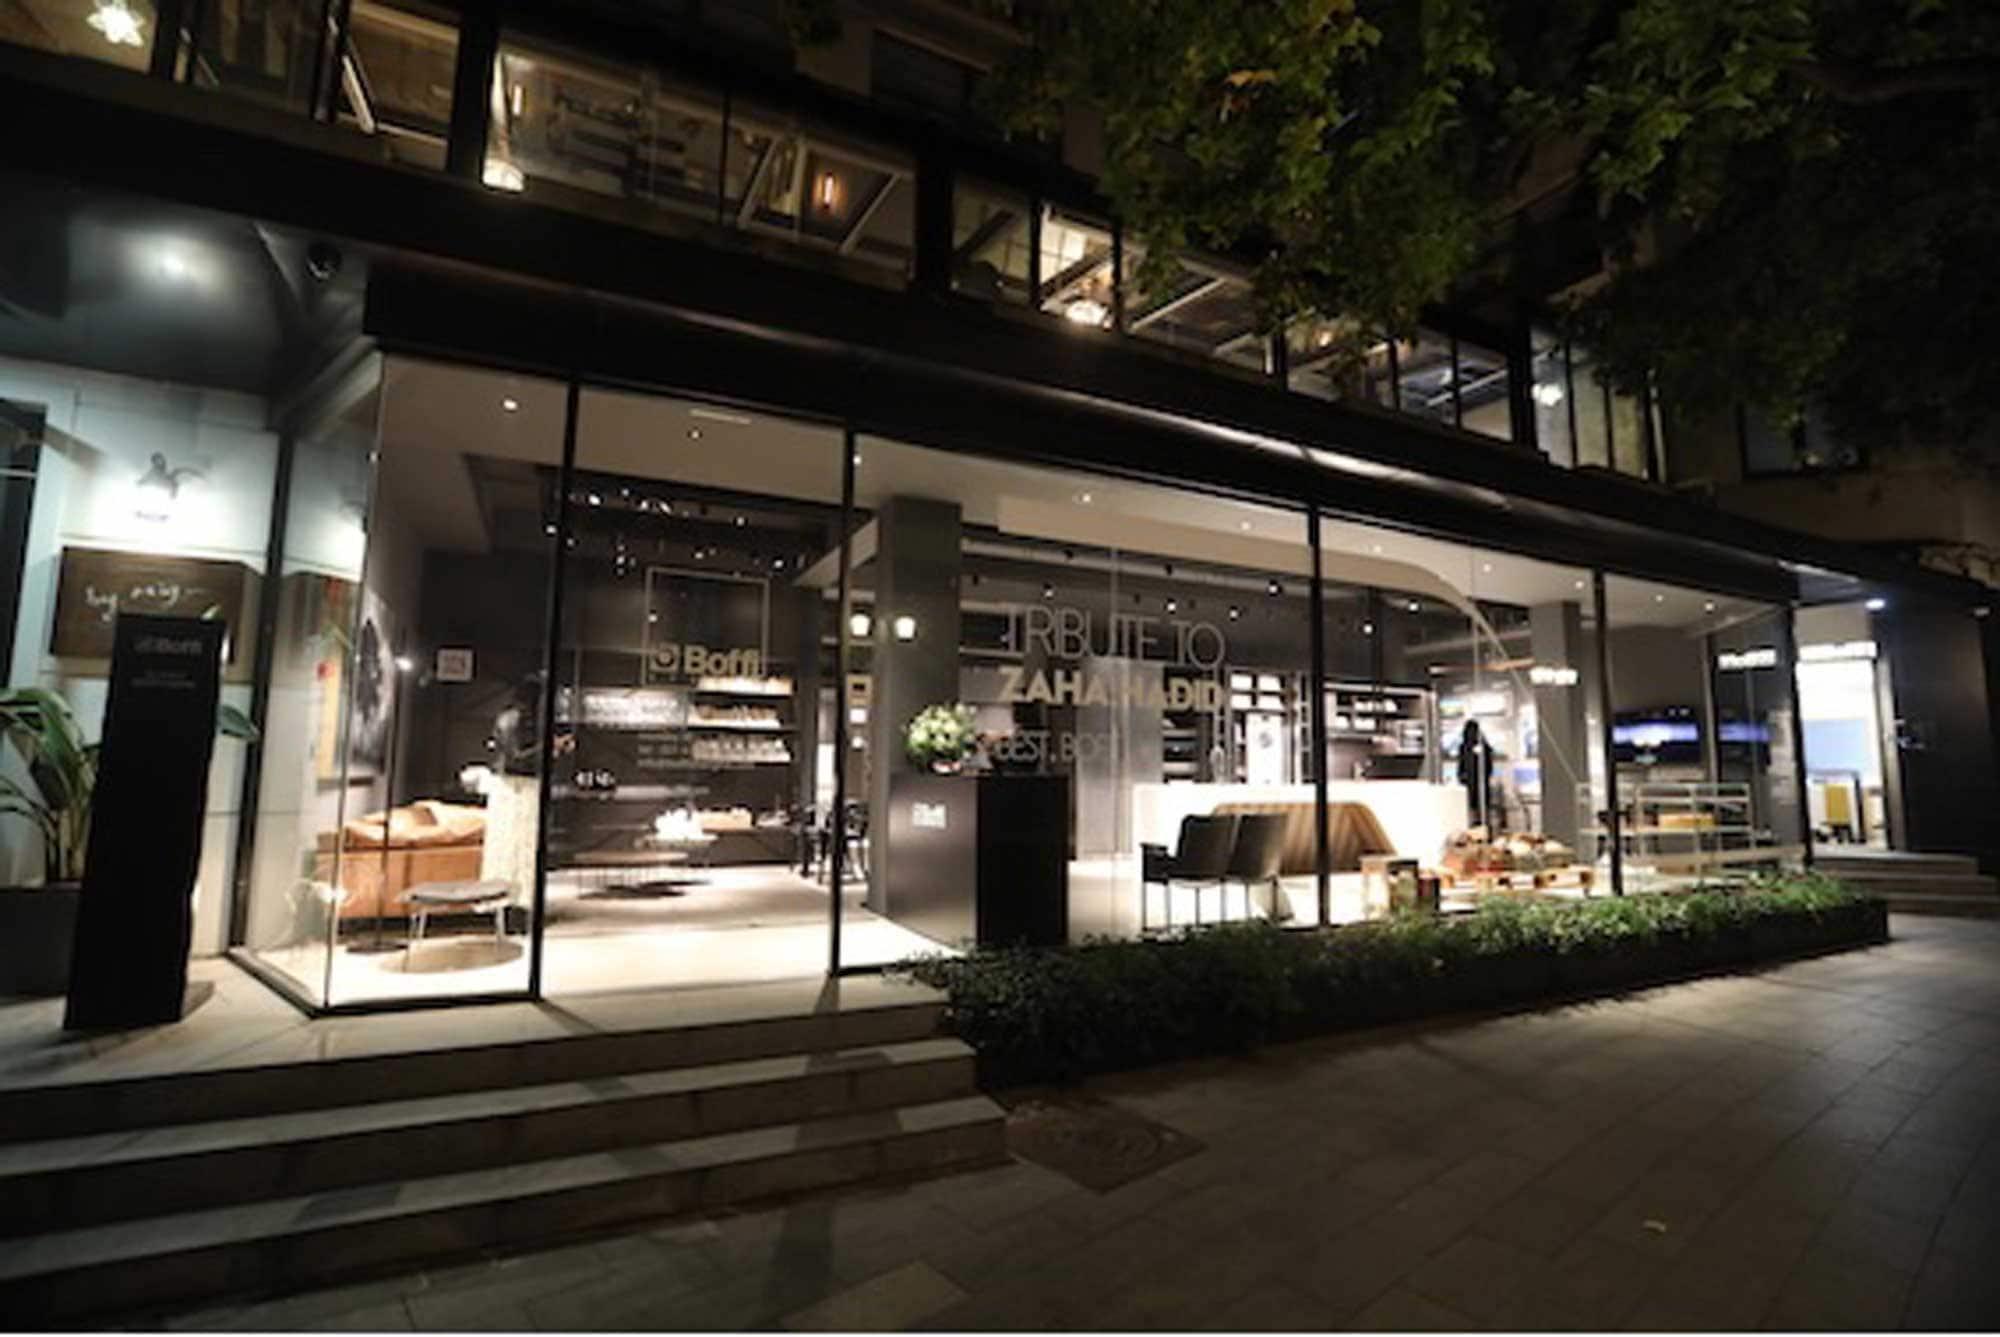 New Opening Boffi Studio Shanghai, with De Padova and Boffi.